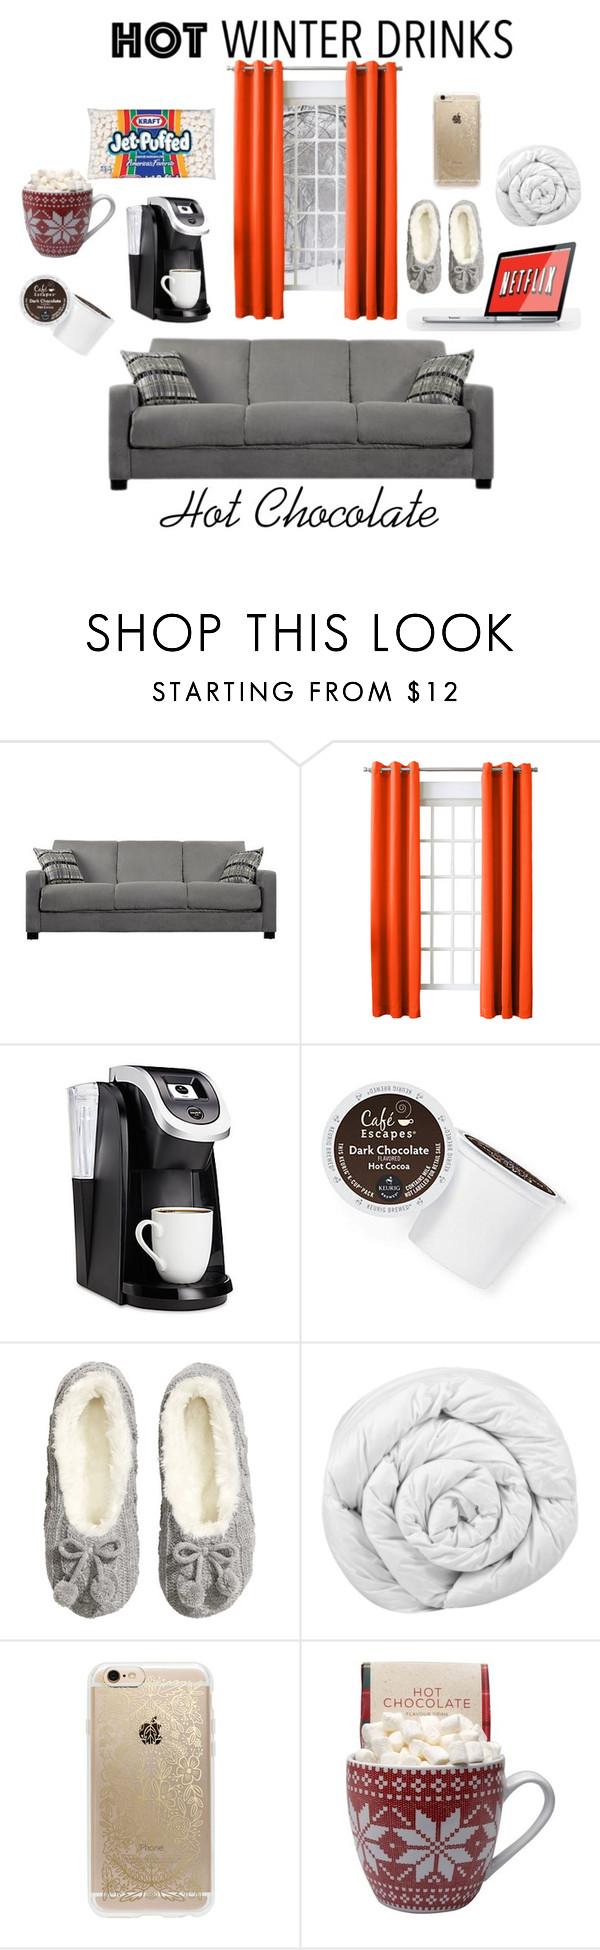 """Hot Cocoa"" by maisy-loren ❤ liked on Polyvore featuring interior, interiors, interior design, home, home decor, interior decorating, Hearts Attic, Sun Zero, Keurig and H&M"